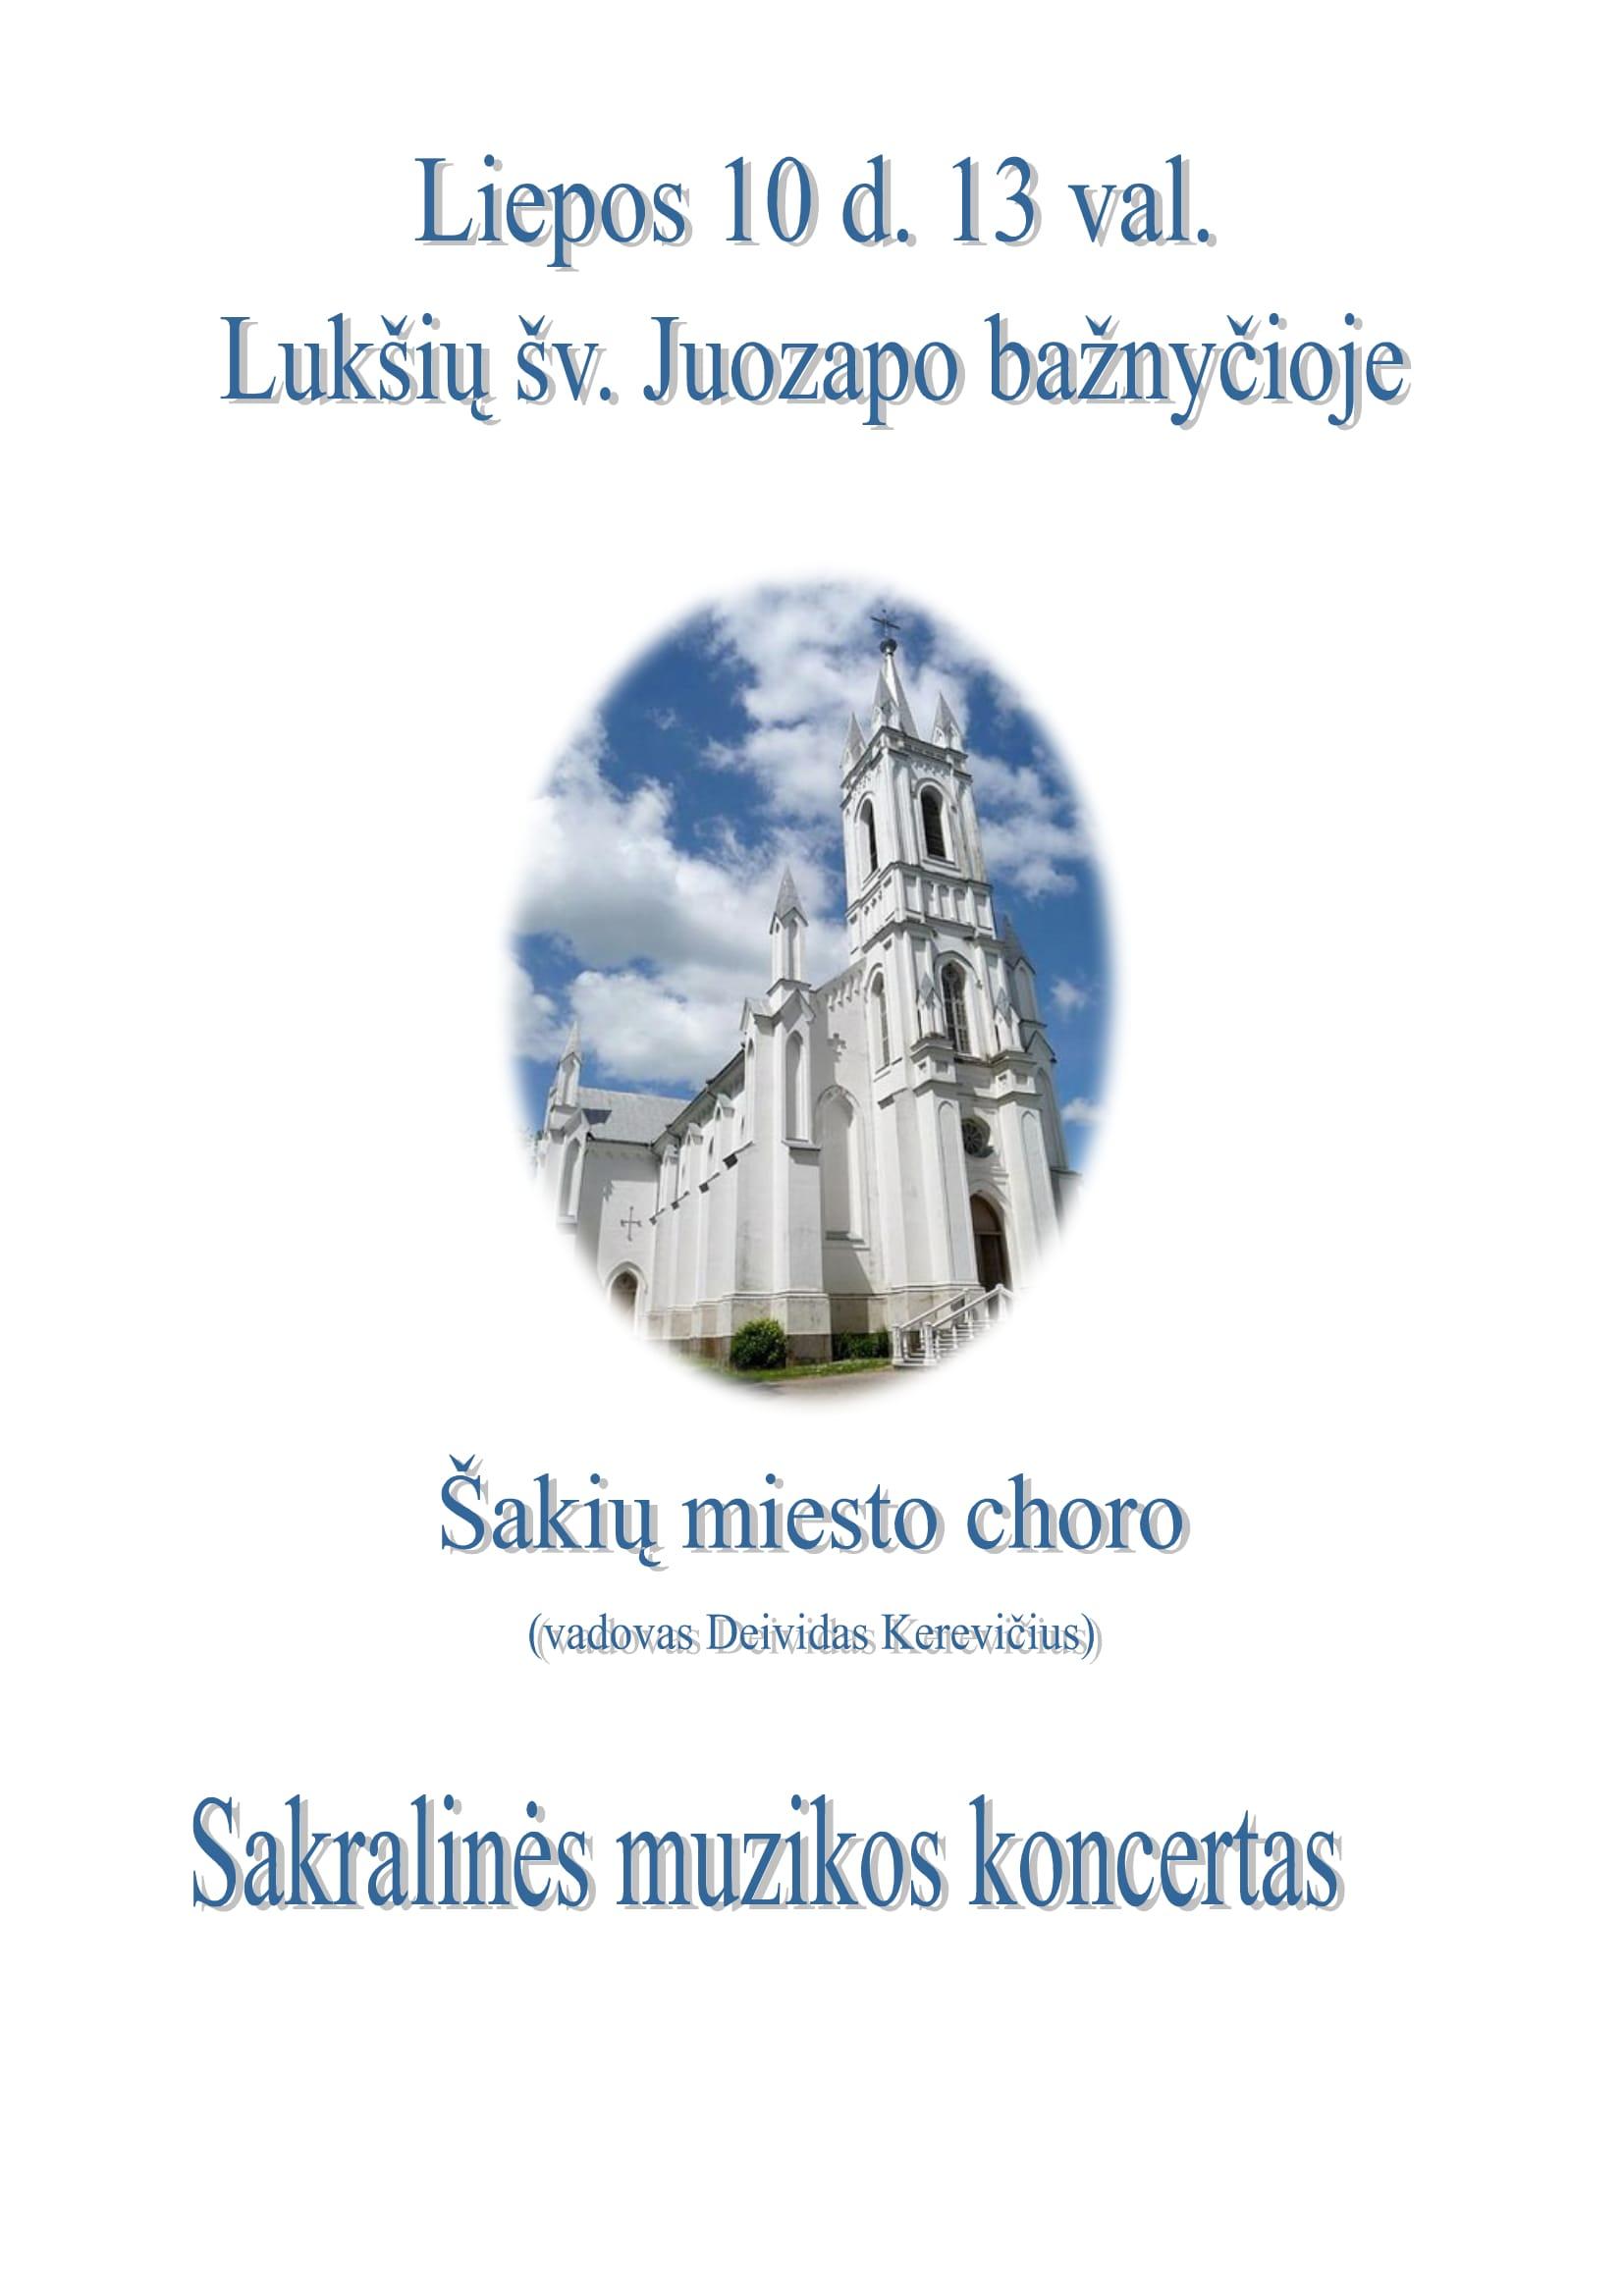 SakralinesMuzikosKoncertas-1